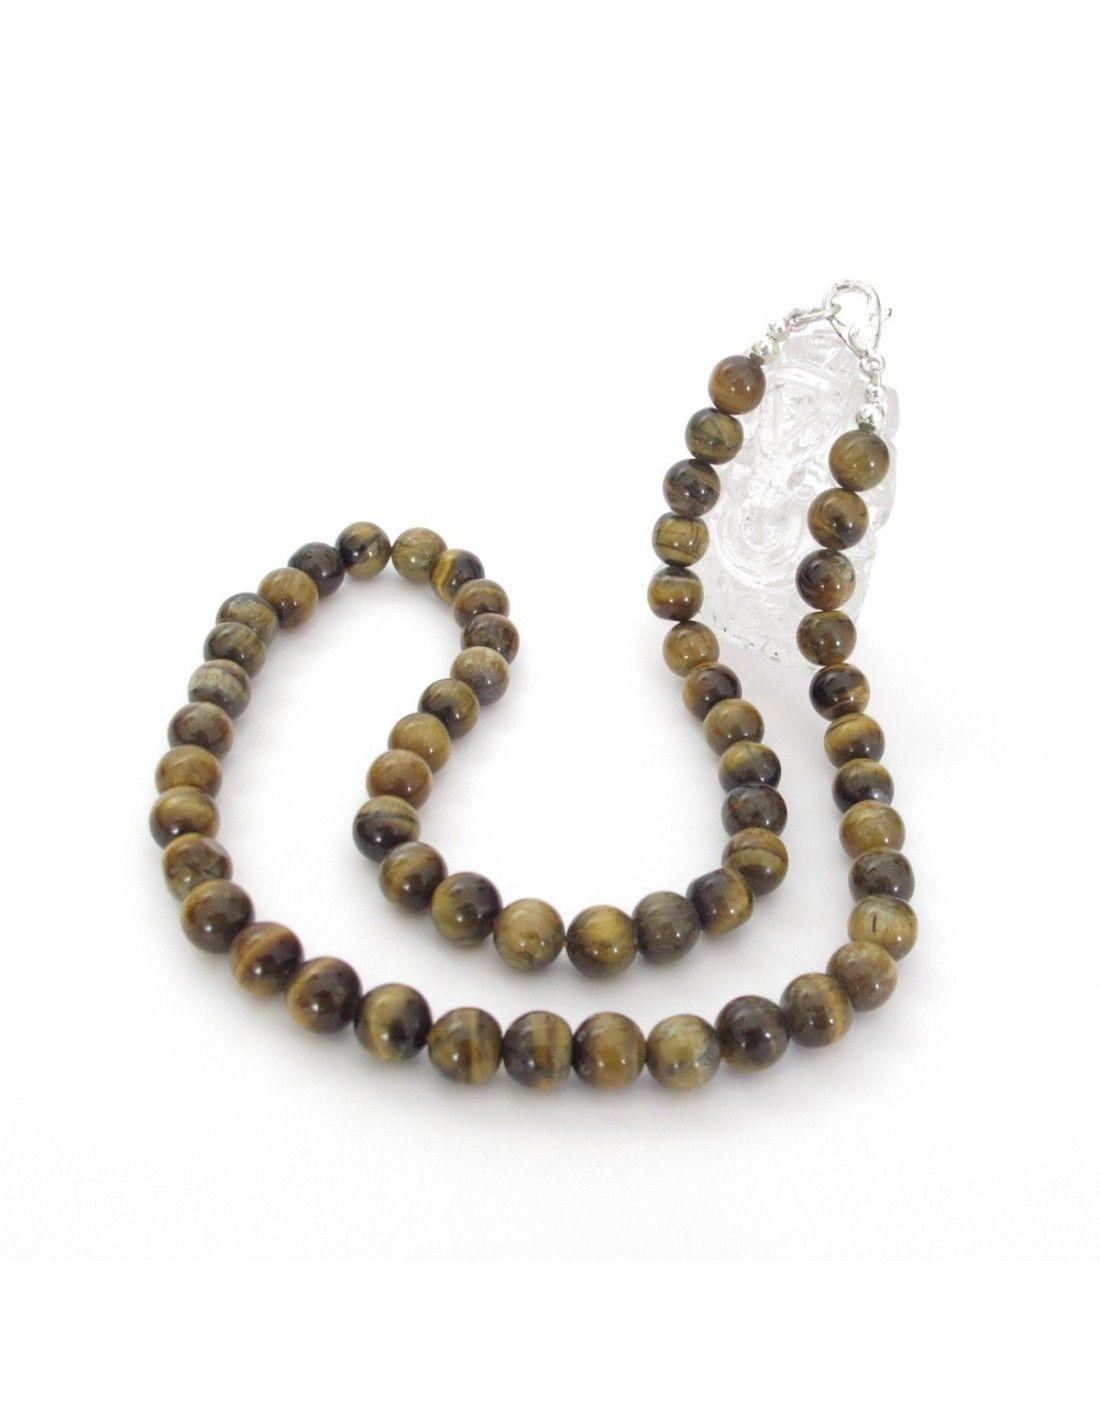 collier de perles rondes oeil de tigre 8mm bijoux en pierres cp22. Black Bedroom Furniture Sets. Home Design Ideas